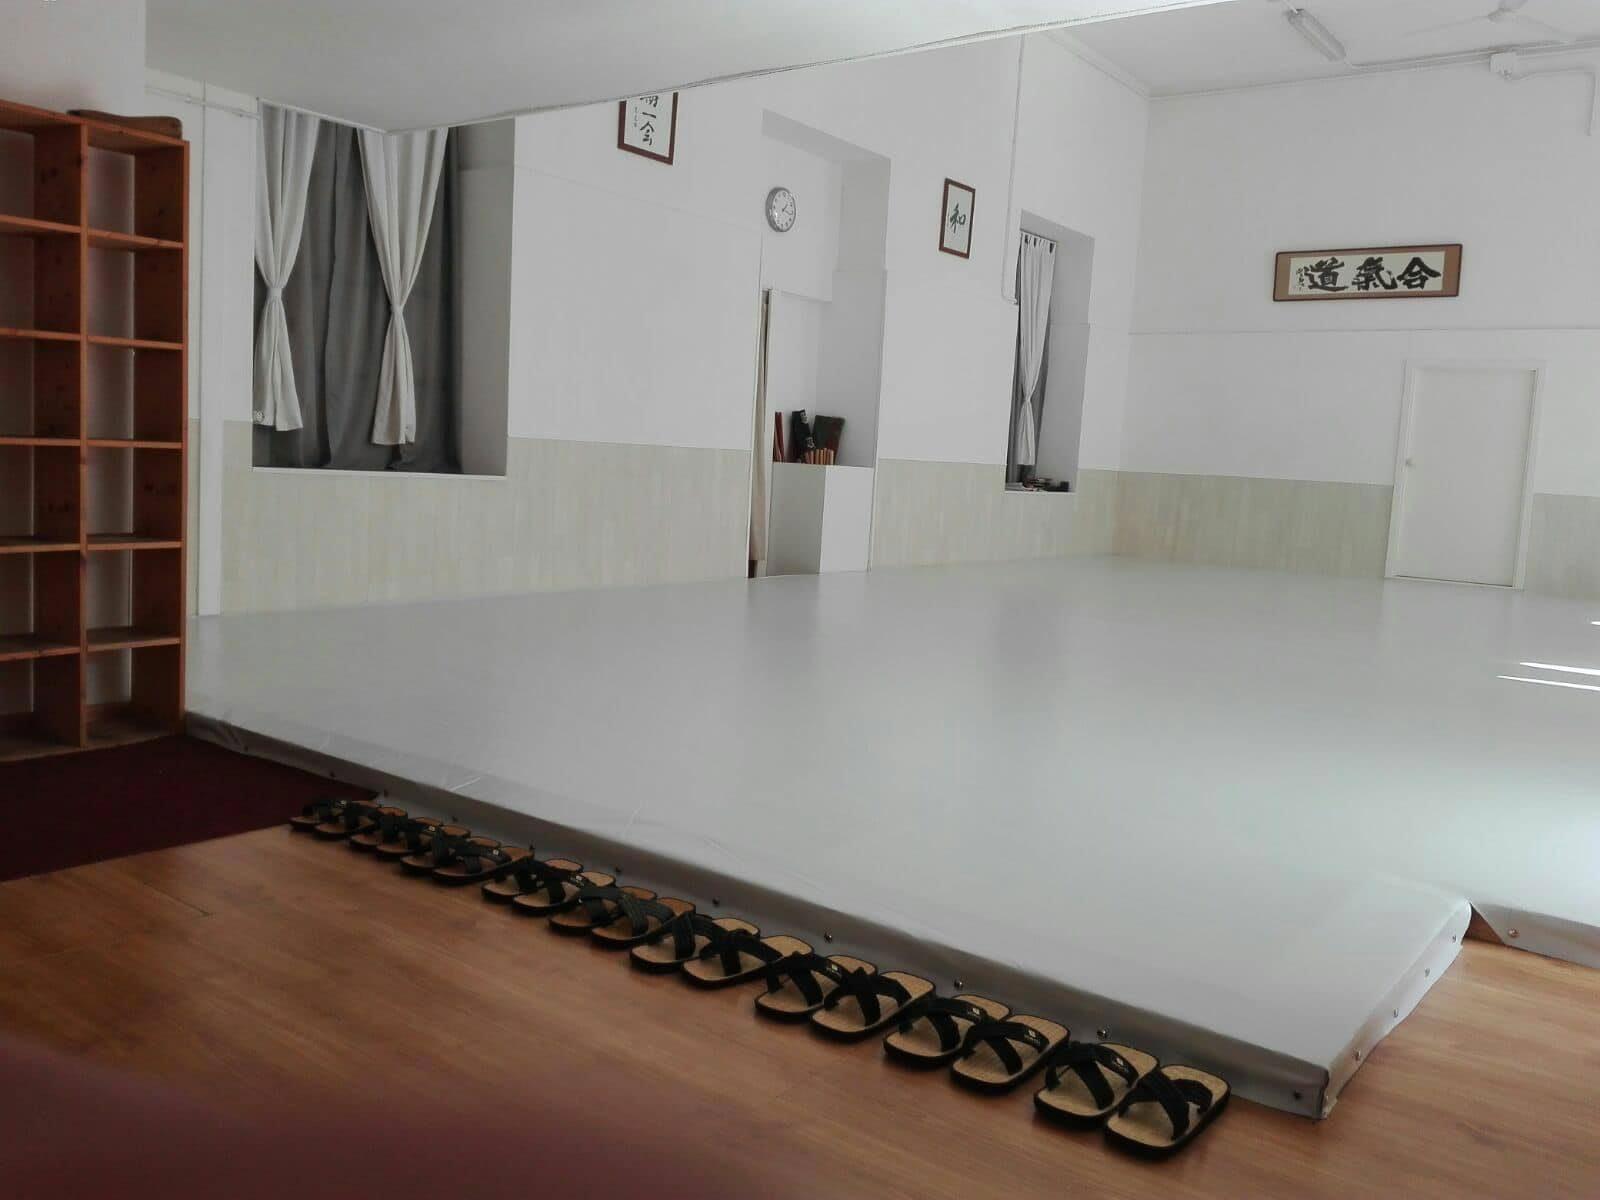 dojo-karatekai-caserta